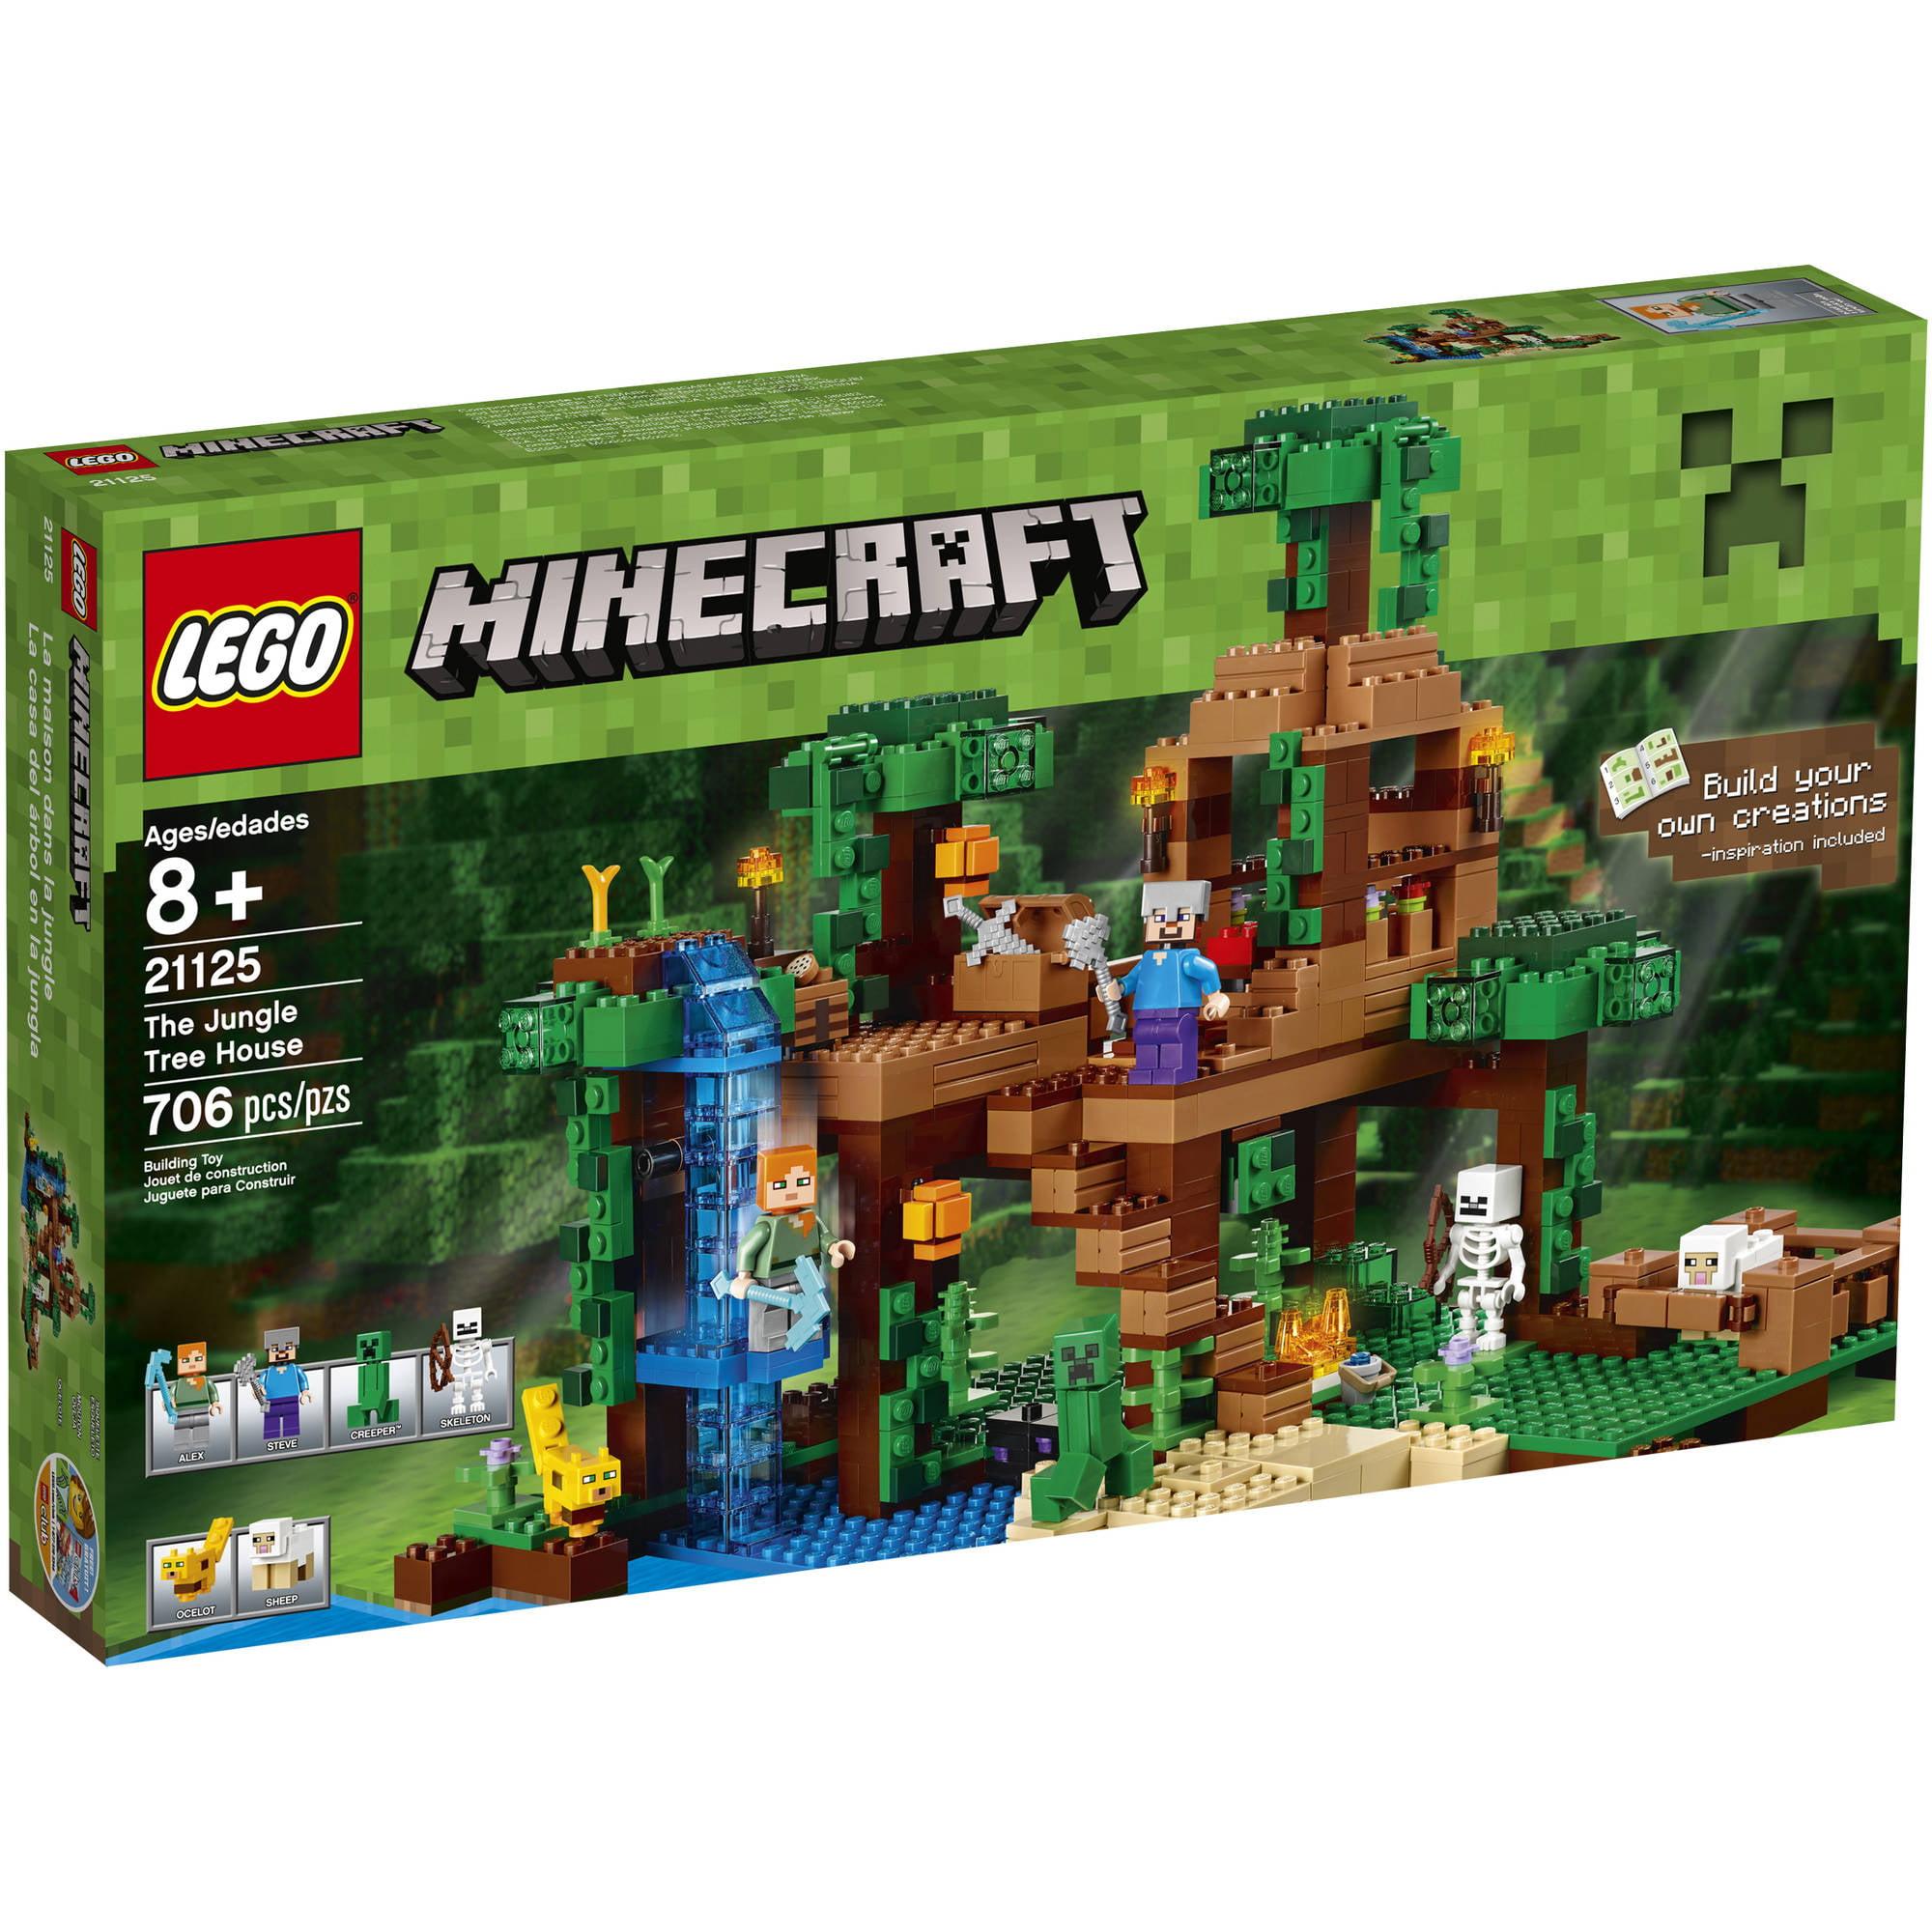 LEGO Minecraft The Jungle Tree House, 21125